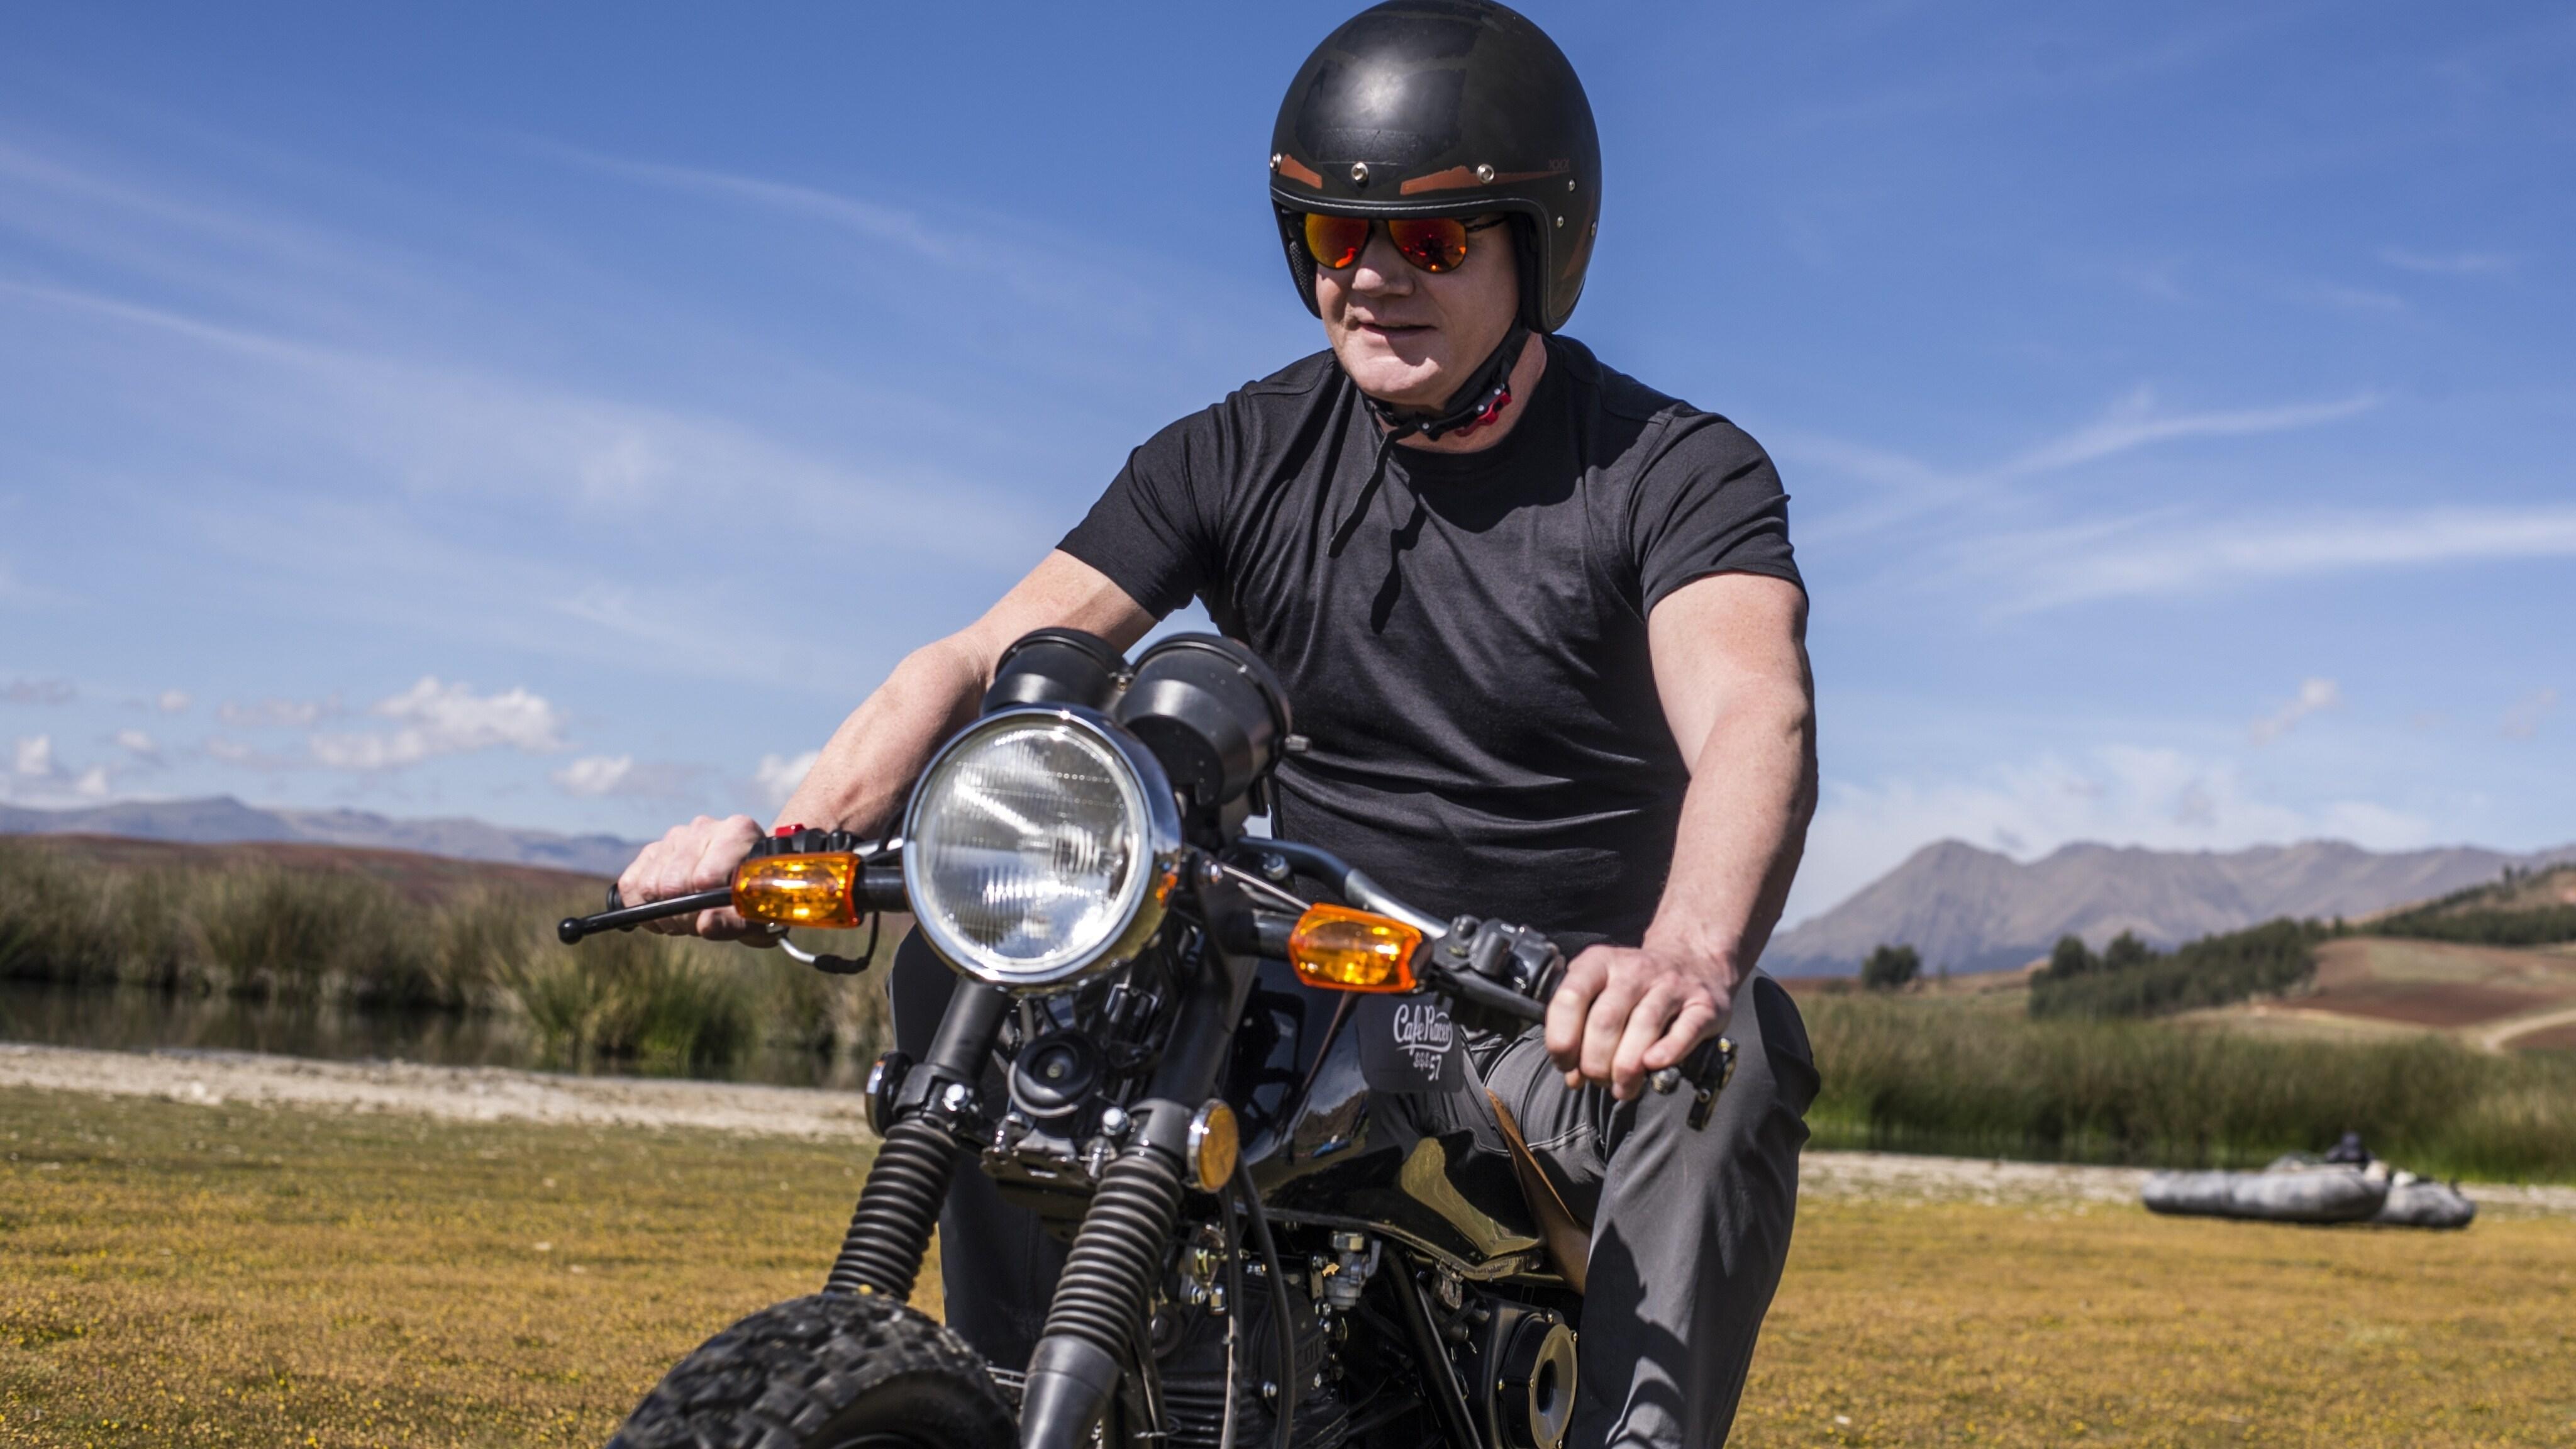 Gordon Ramsay 'Uncharted' S2 Image